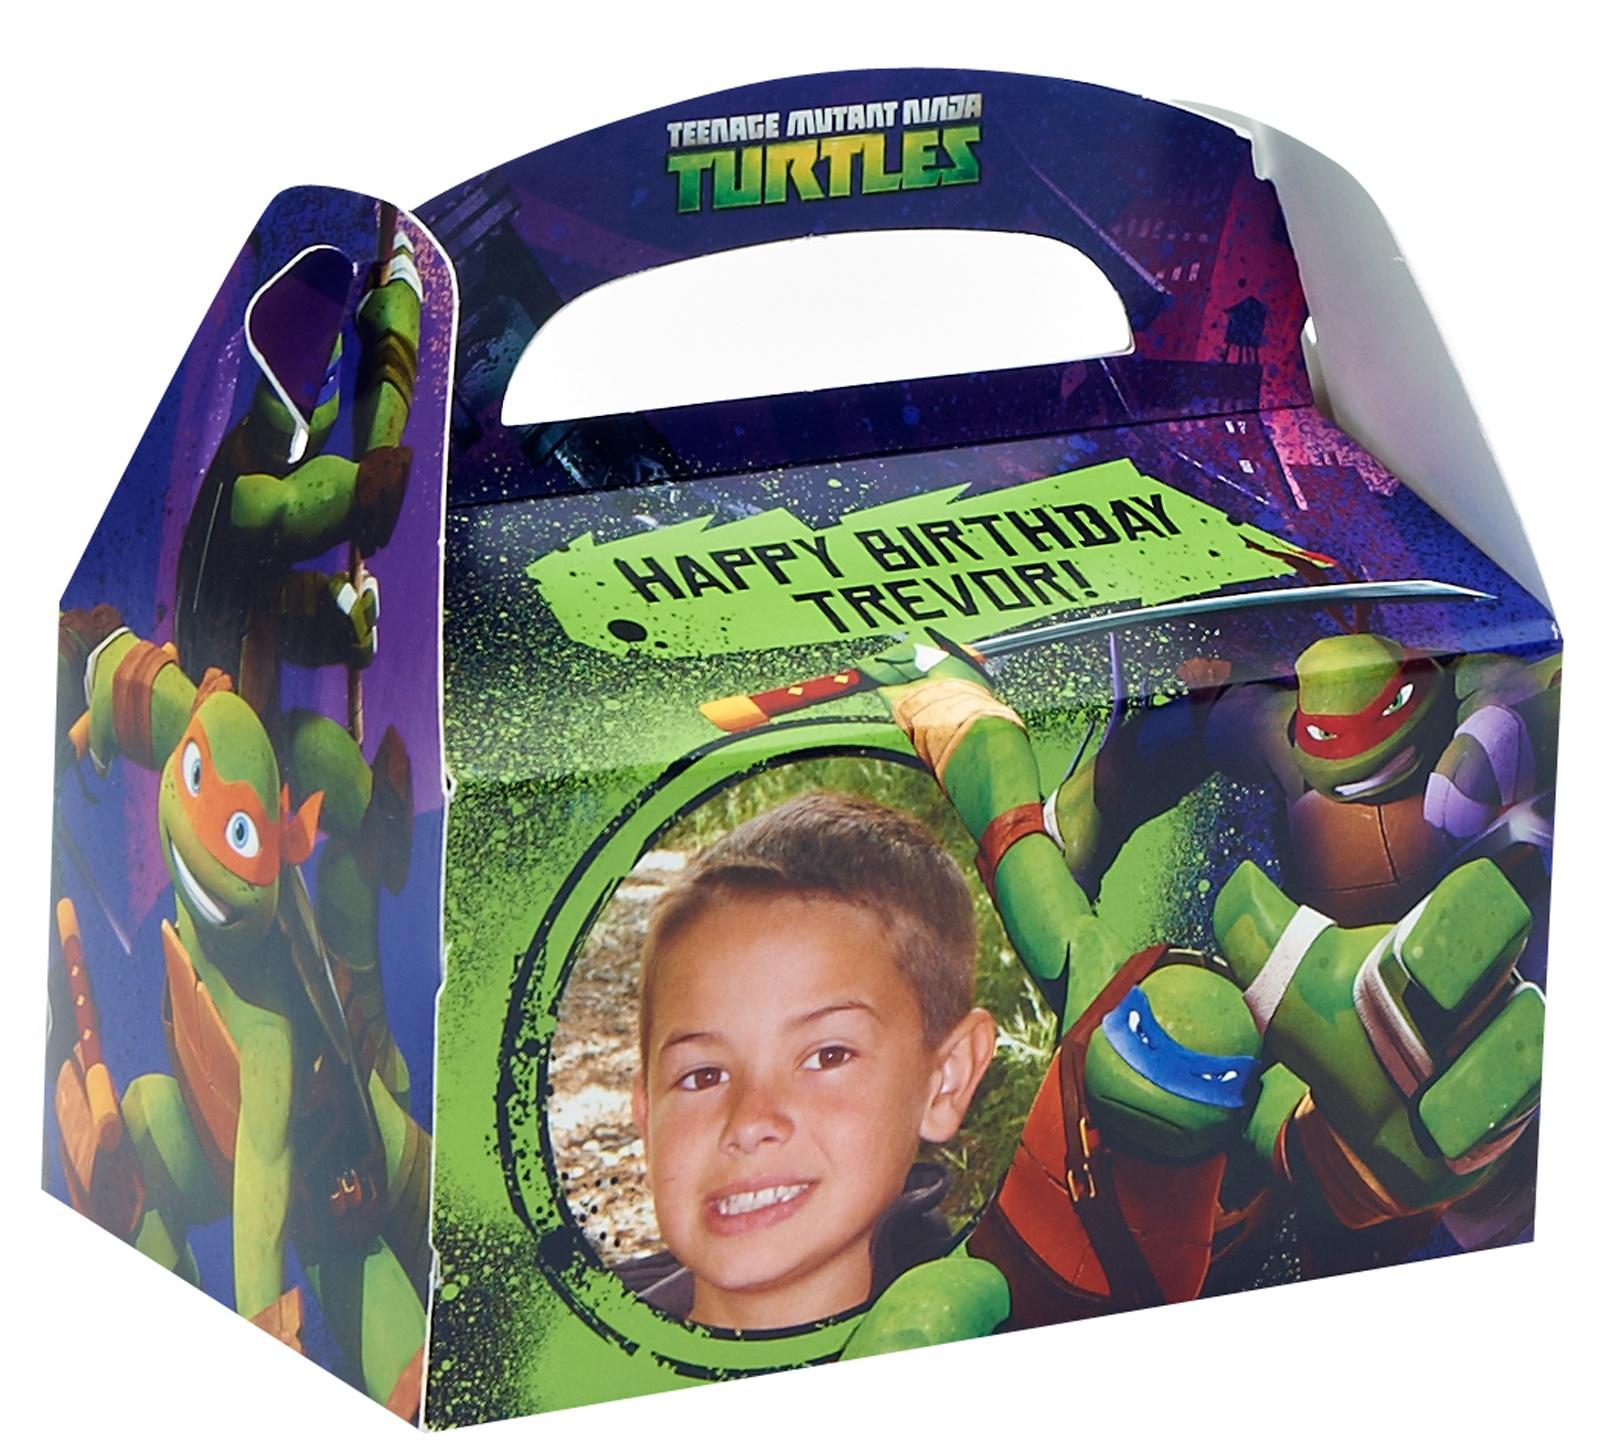 Teenage Mutant Ninja Turtles Party Supplies: Favor Boxes